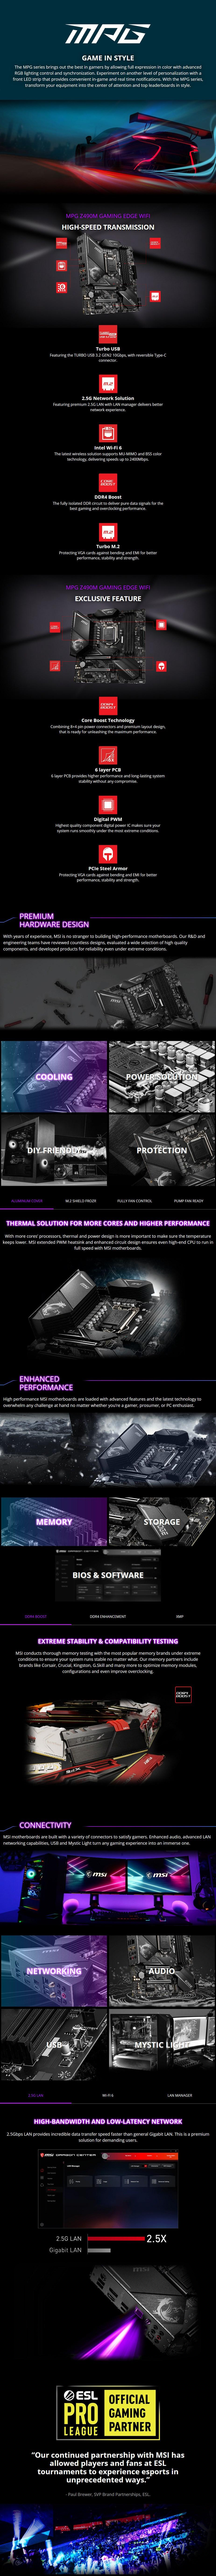 MSI MPG Z490M GAMING EDGE WIFI LGA 1200 Micro-ATX Motherboard - Overview 1